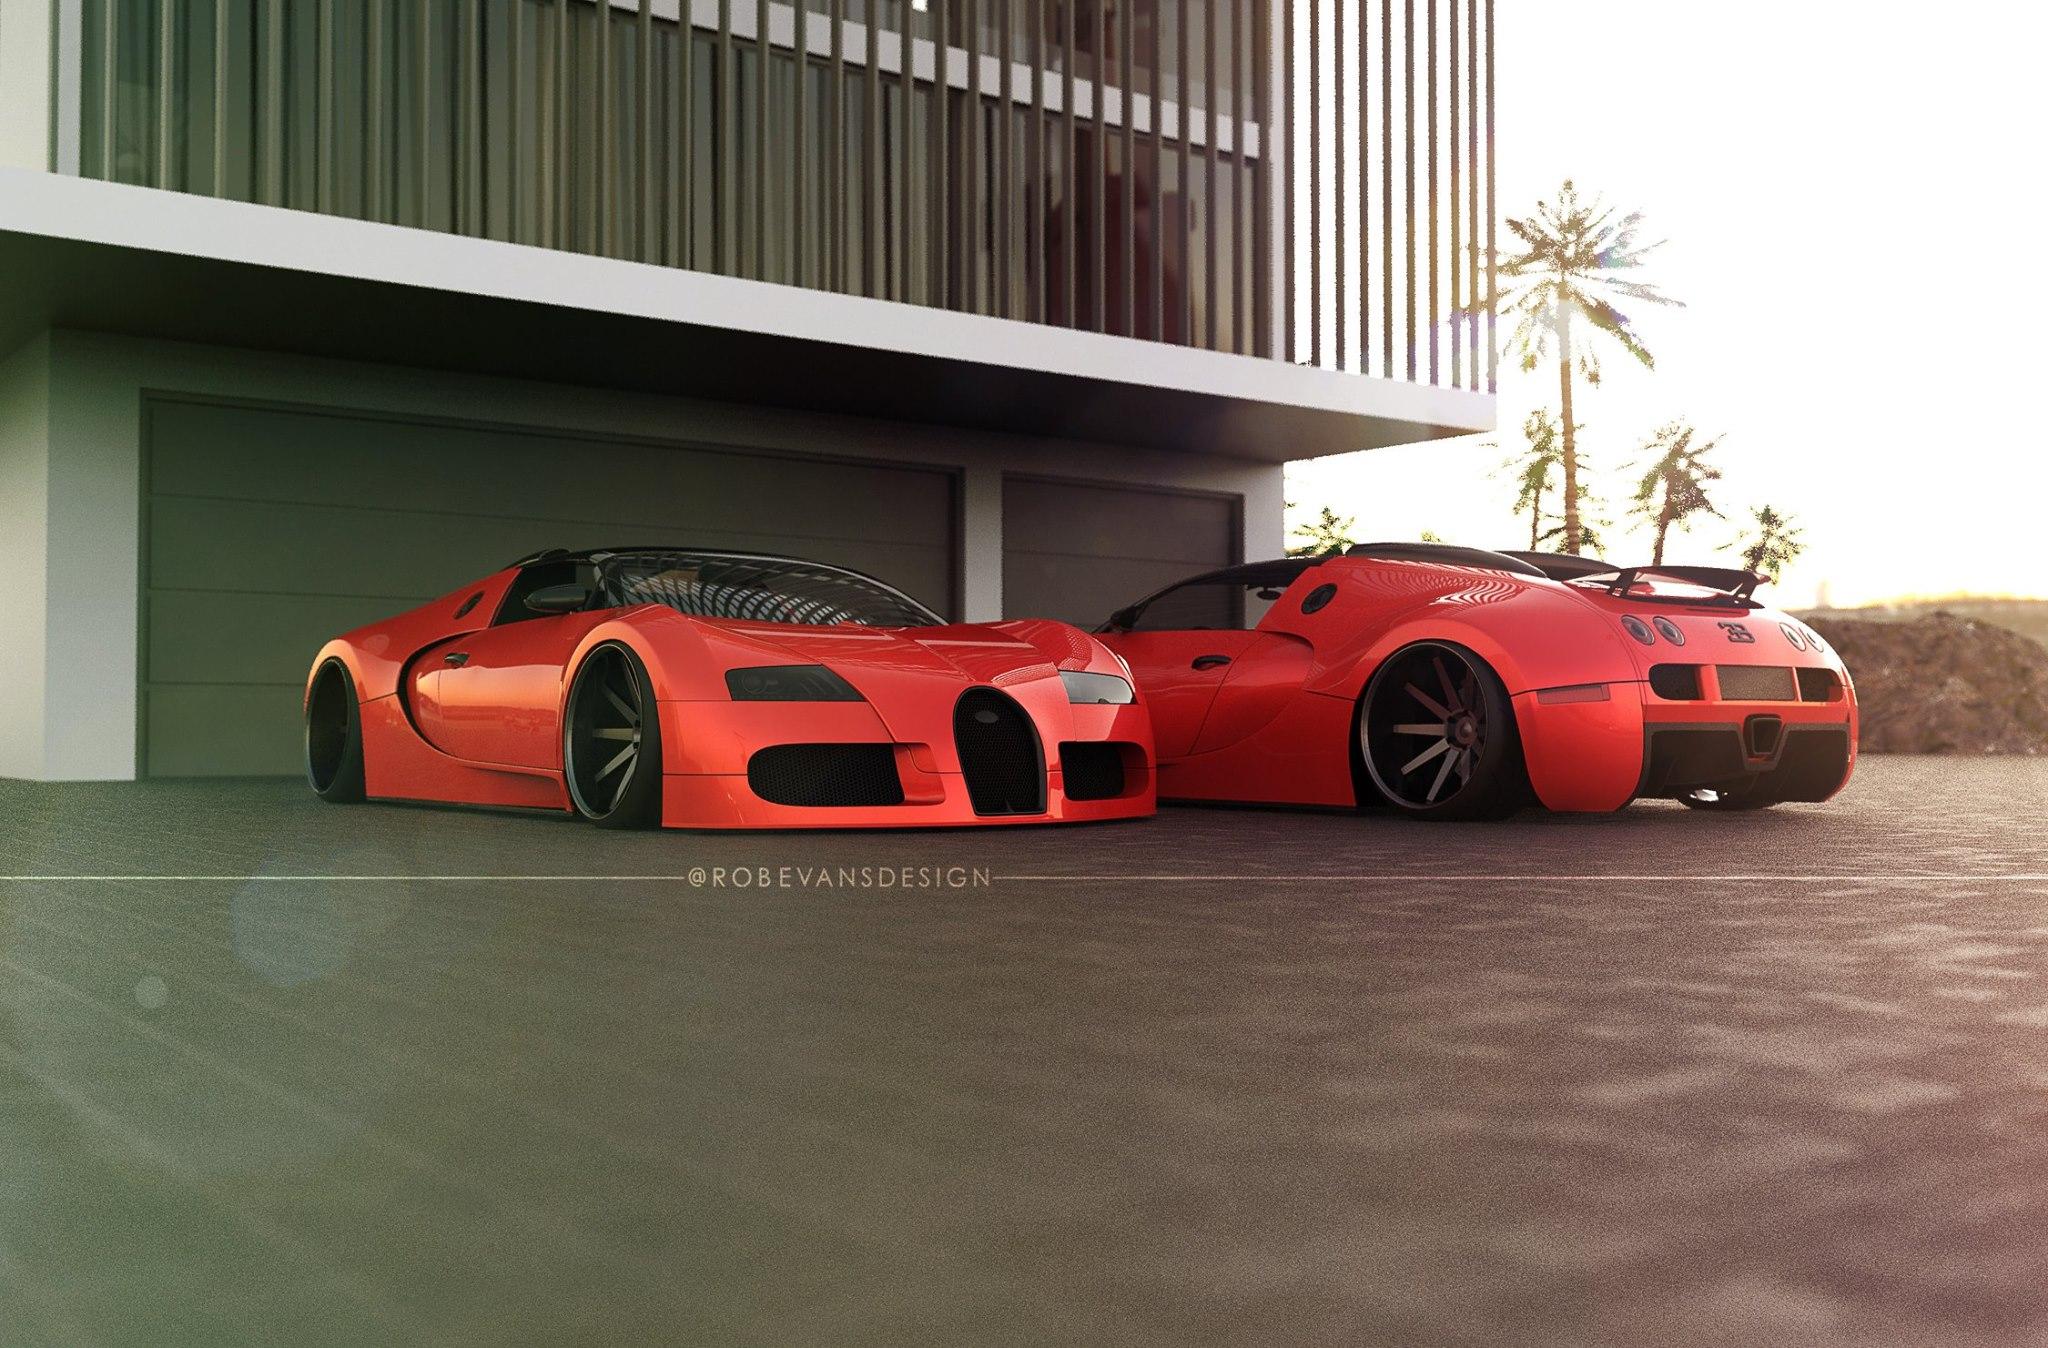 Slammed Bugatti Would Be Crazy Stancenation Form